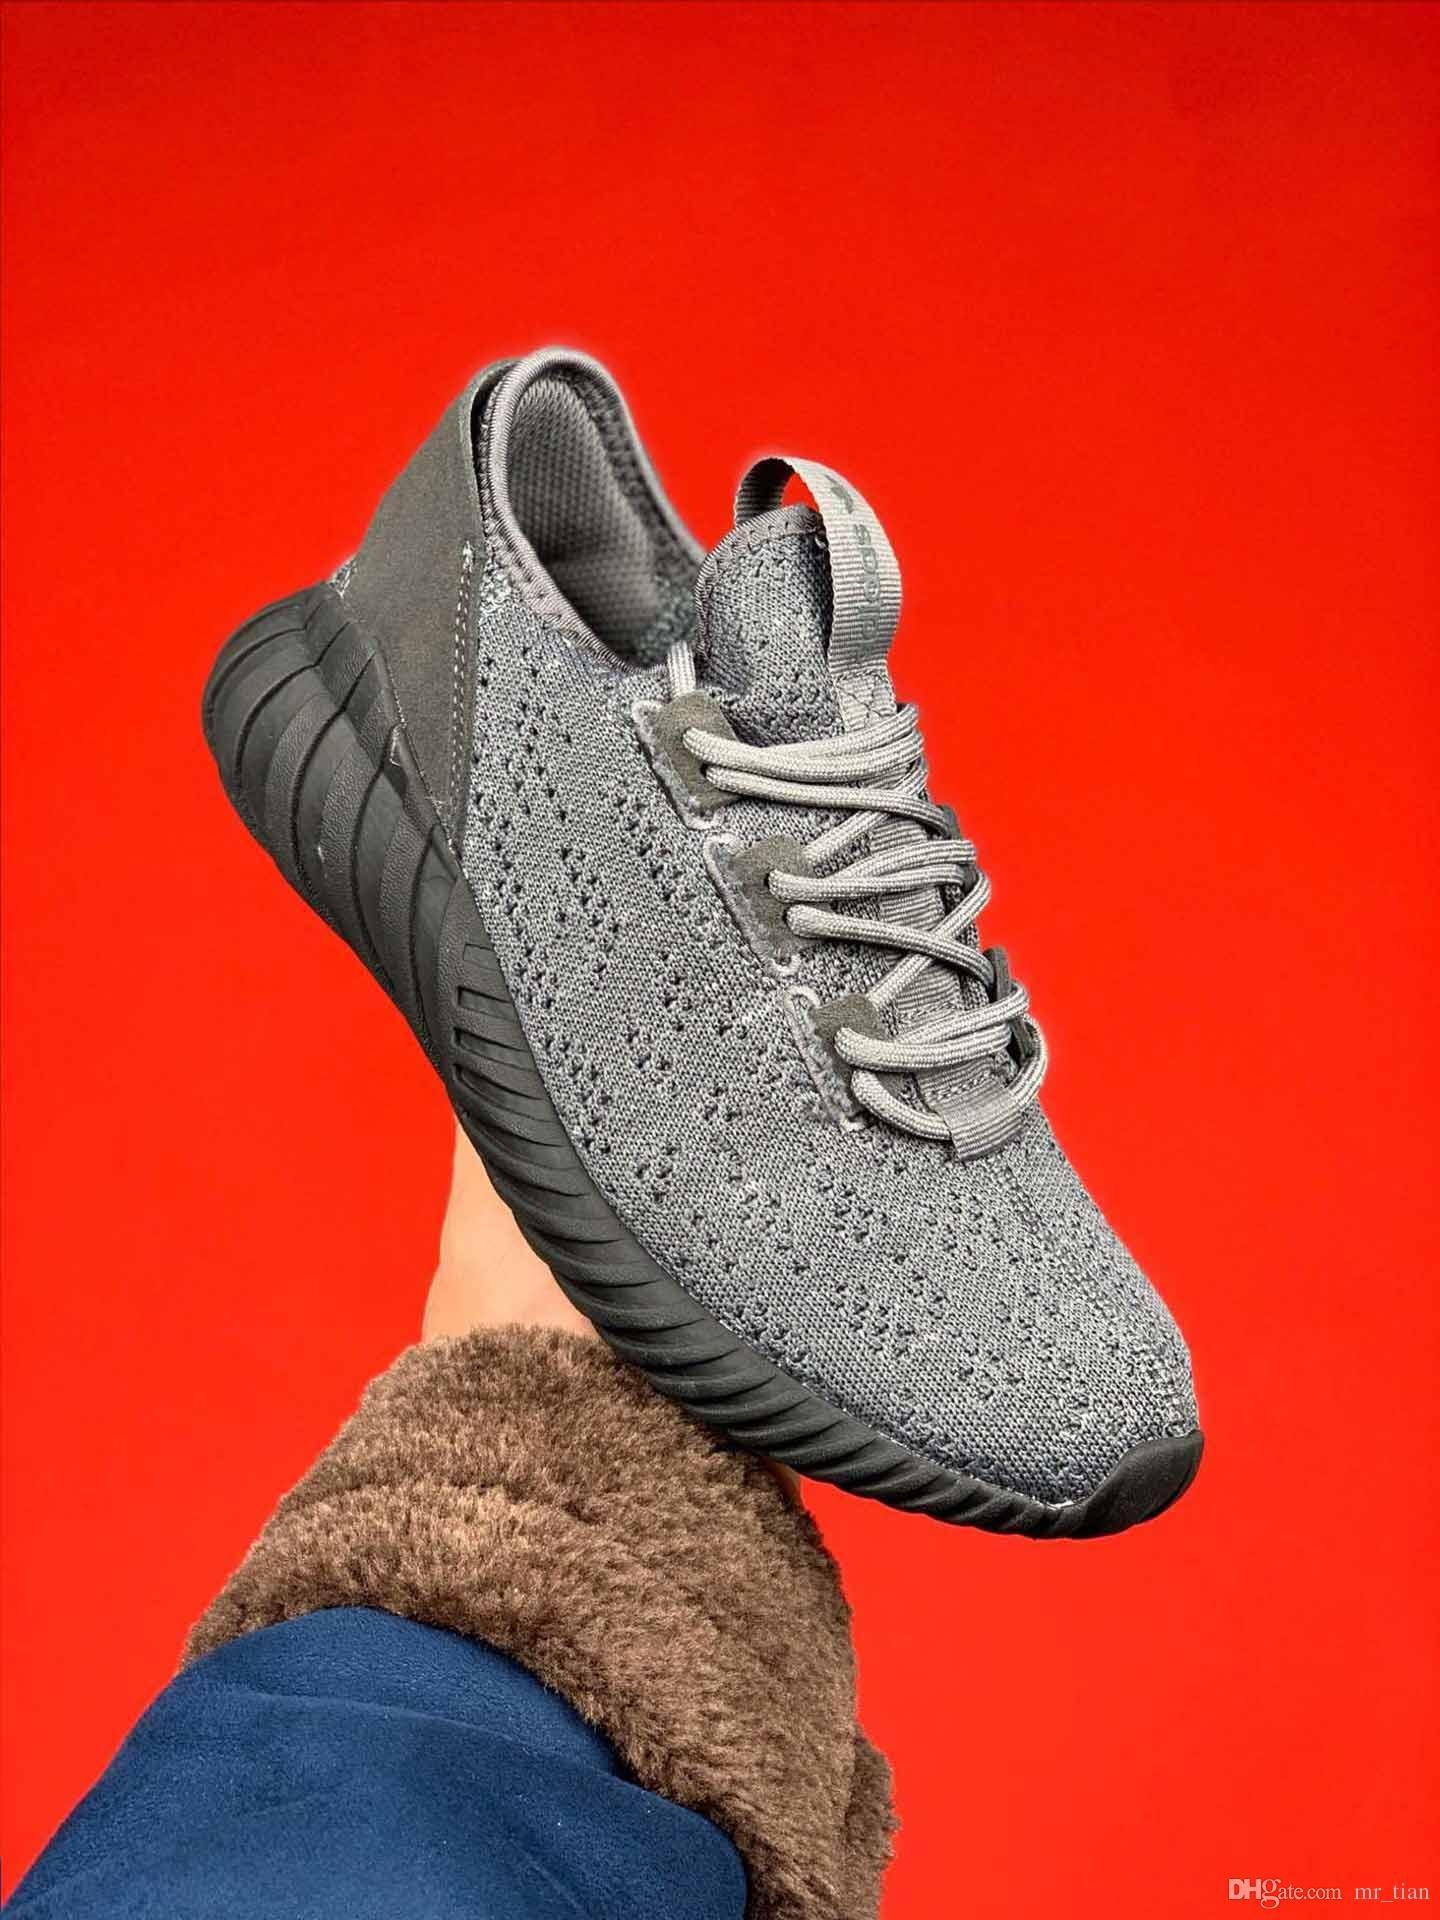 best service 10fec d433e Scarpe Bambini Adidas Tubular Doom Sock PK Running Shoes 2019 Alta Qualità Tubular  Doom Sock PK Uomo E Donna Sneakers, Il Design Più Alla Moda, ...